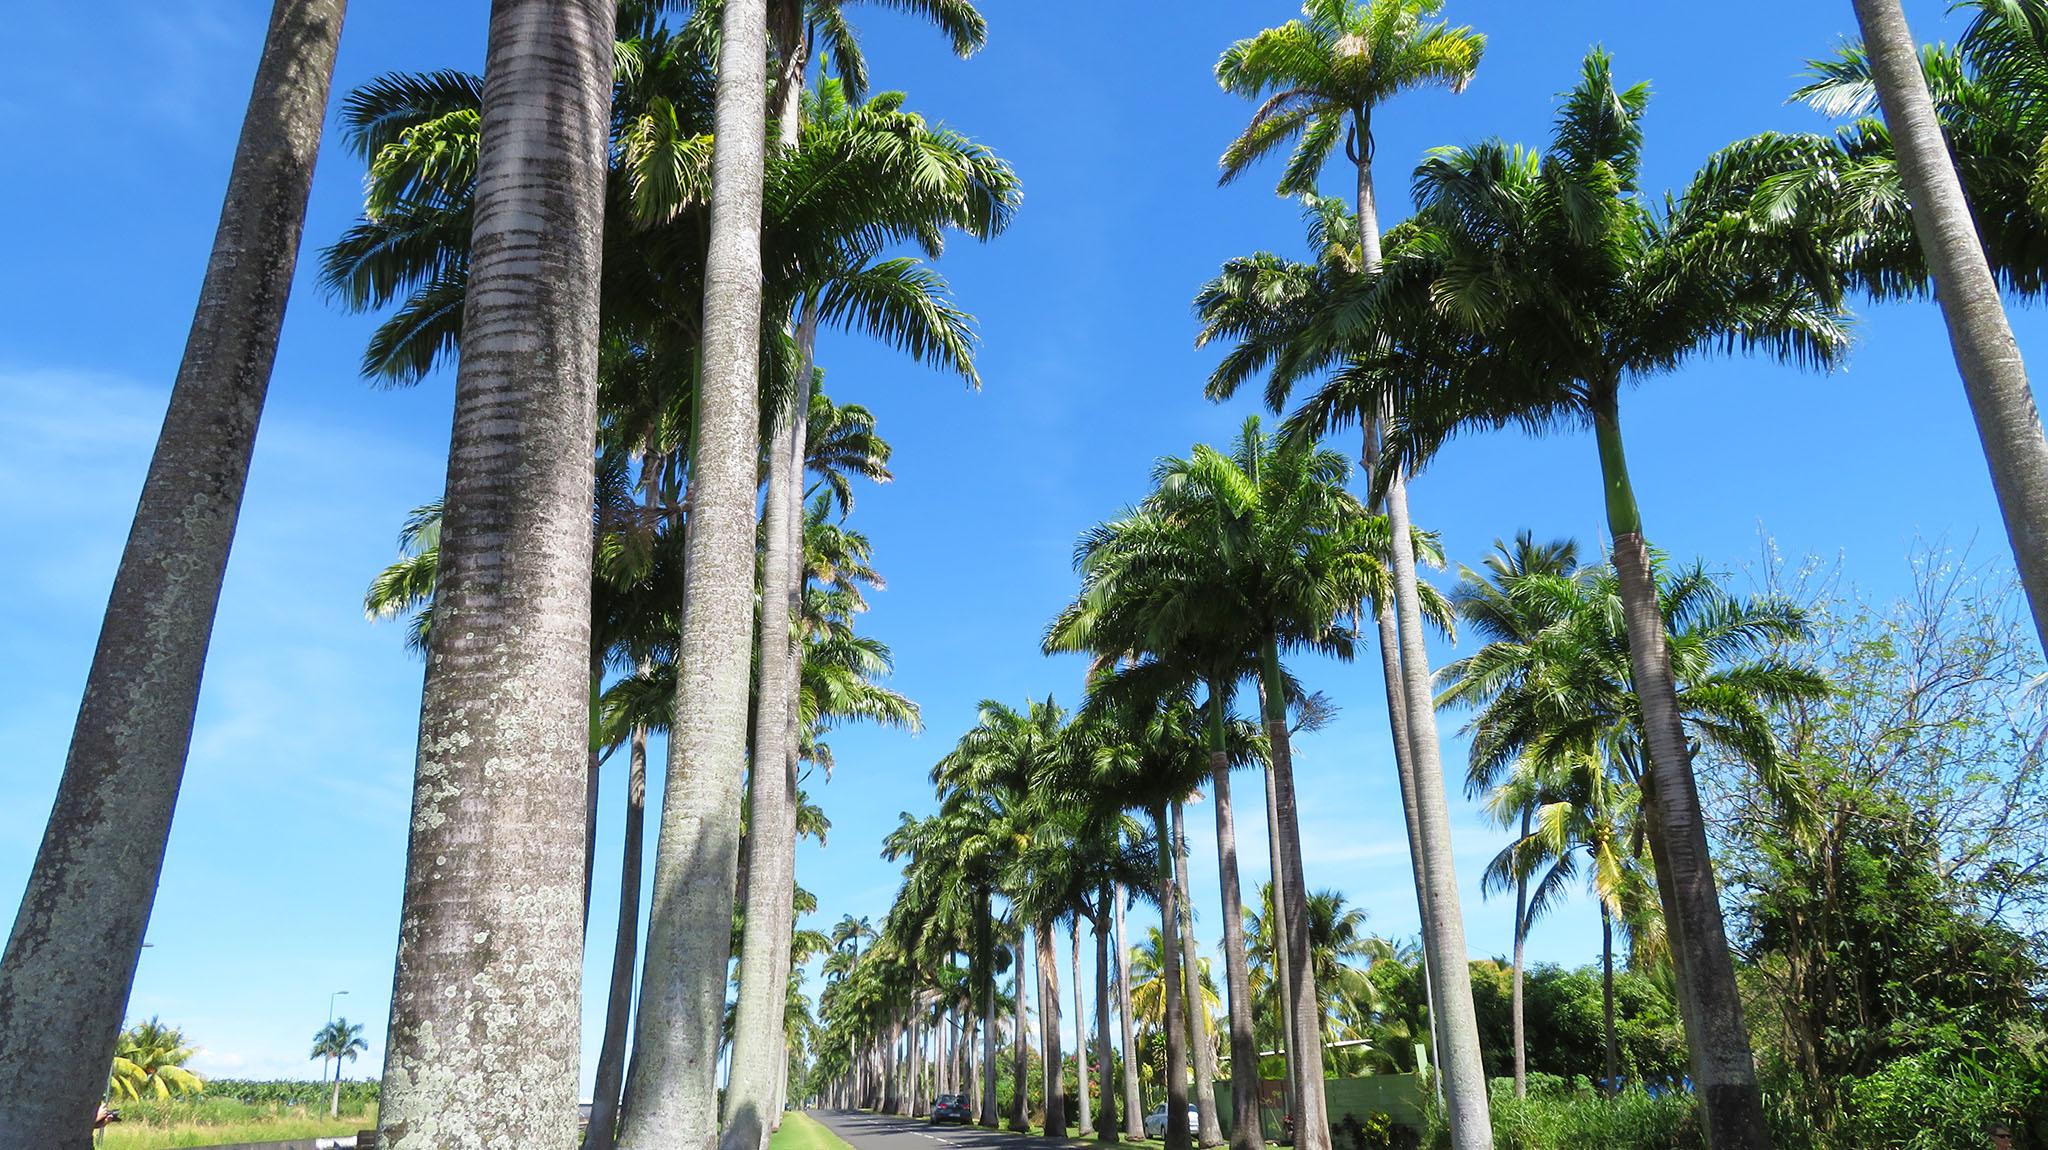 Palmenallee Guadeloupe Ausflug Karibik Kreuzfahrt